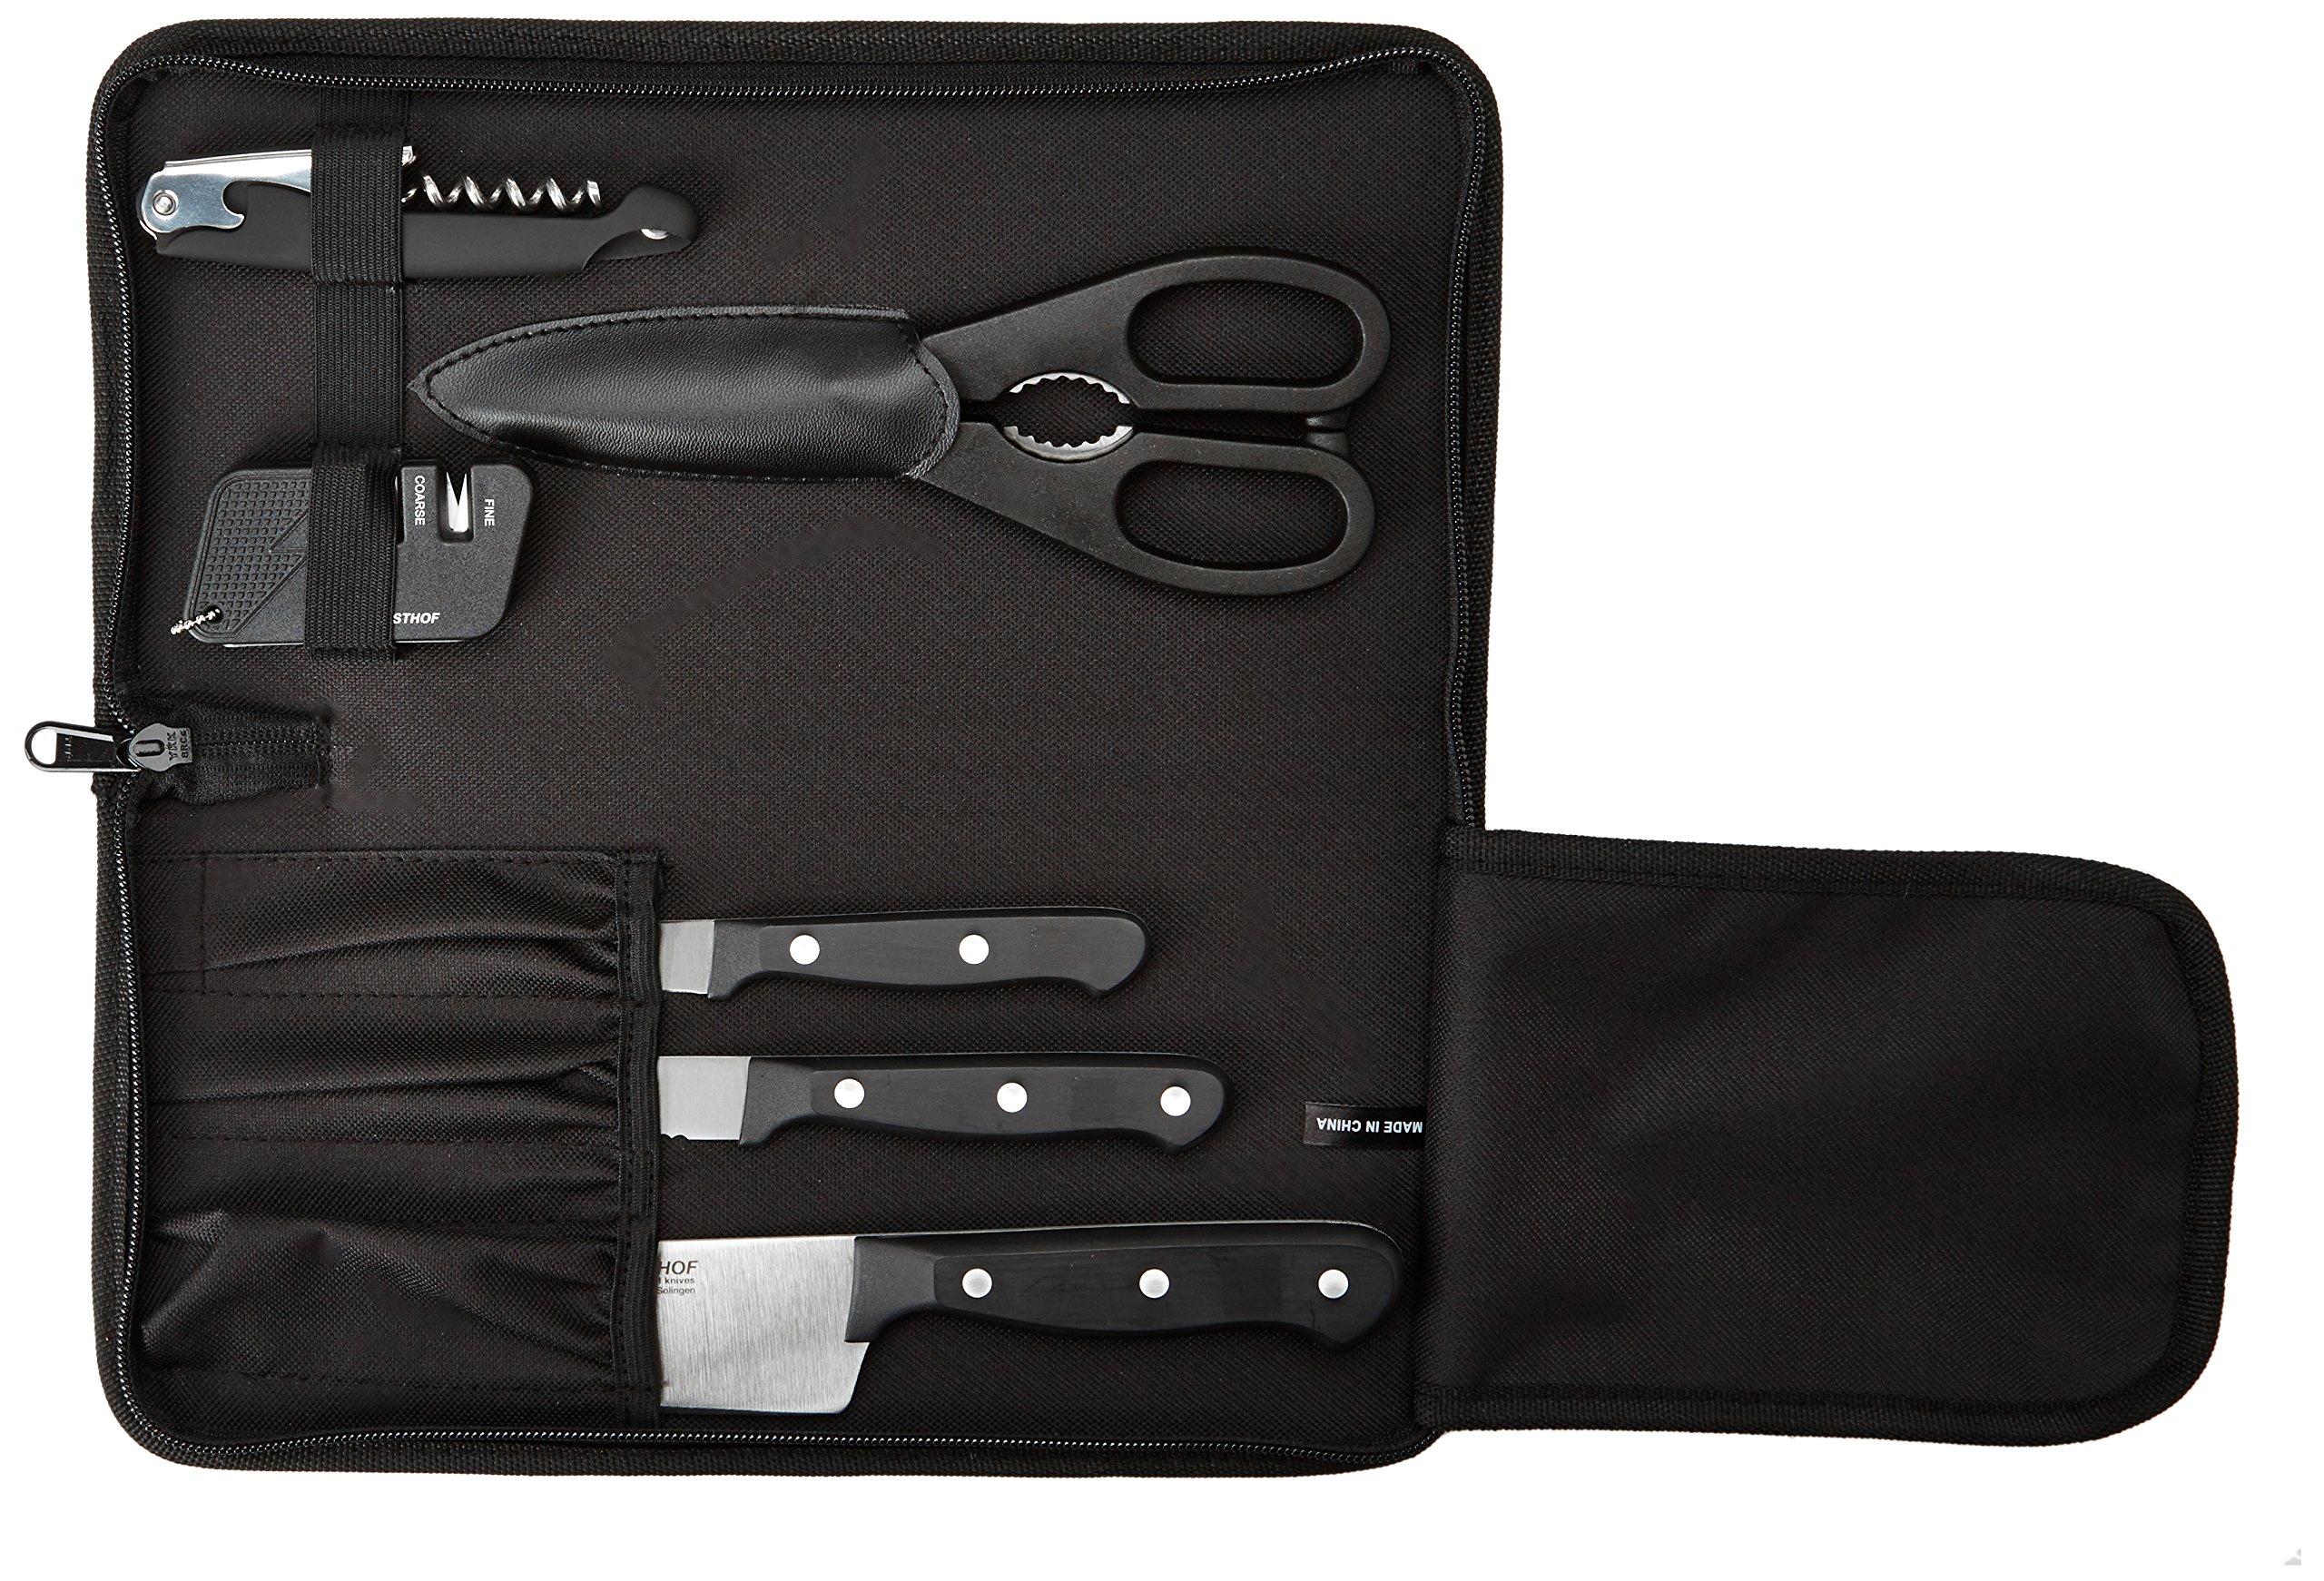 WÜSTHOF Gourmet Seven Piece Traveler Knife Set | 7-Piece German Knife Set with Traveler Case | Precise Laser Cut High Carbon Stainless Steel Kitchen Knife Set - Model 8957